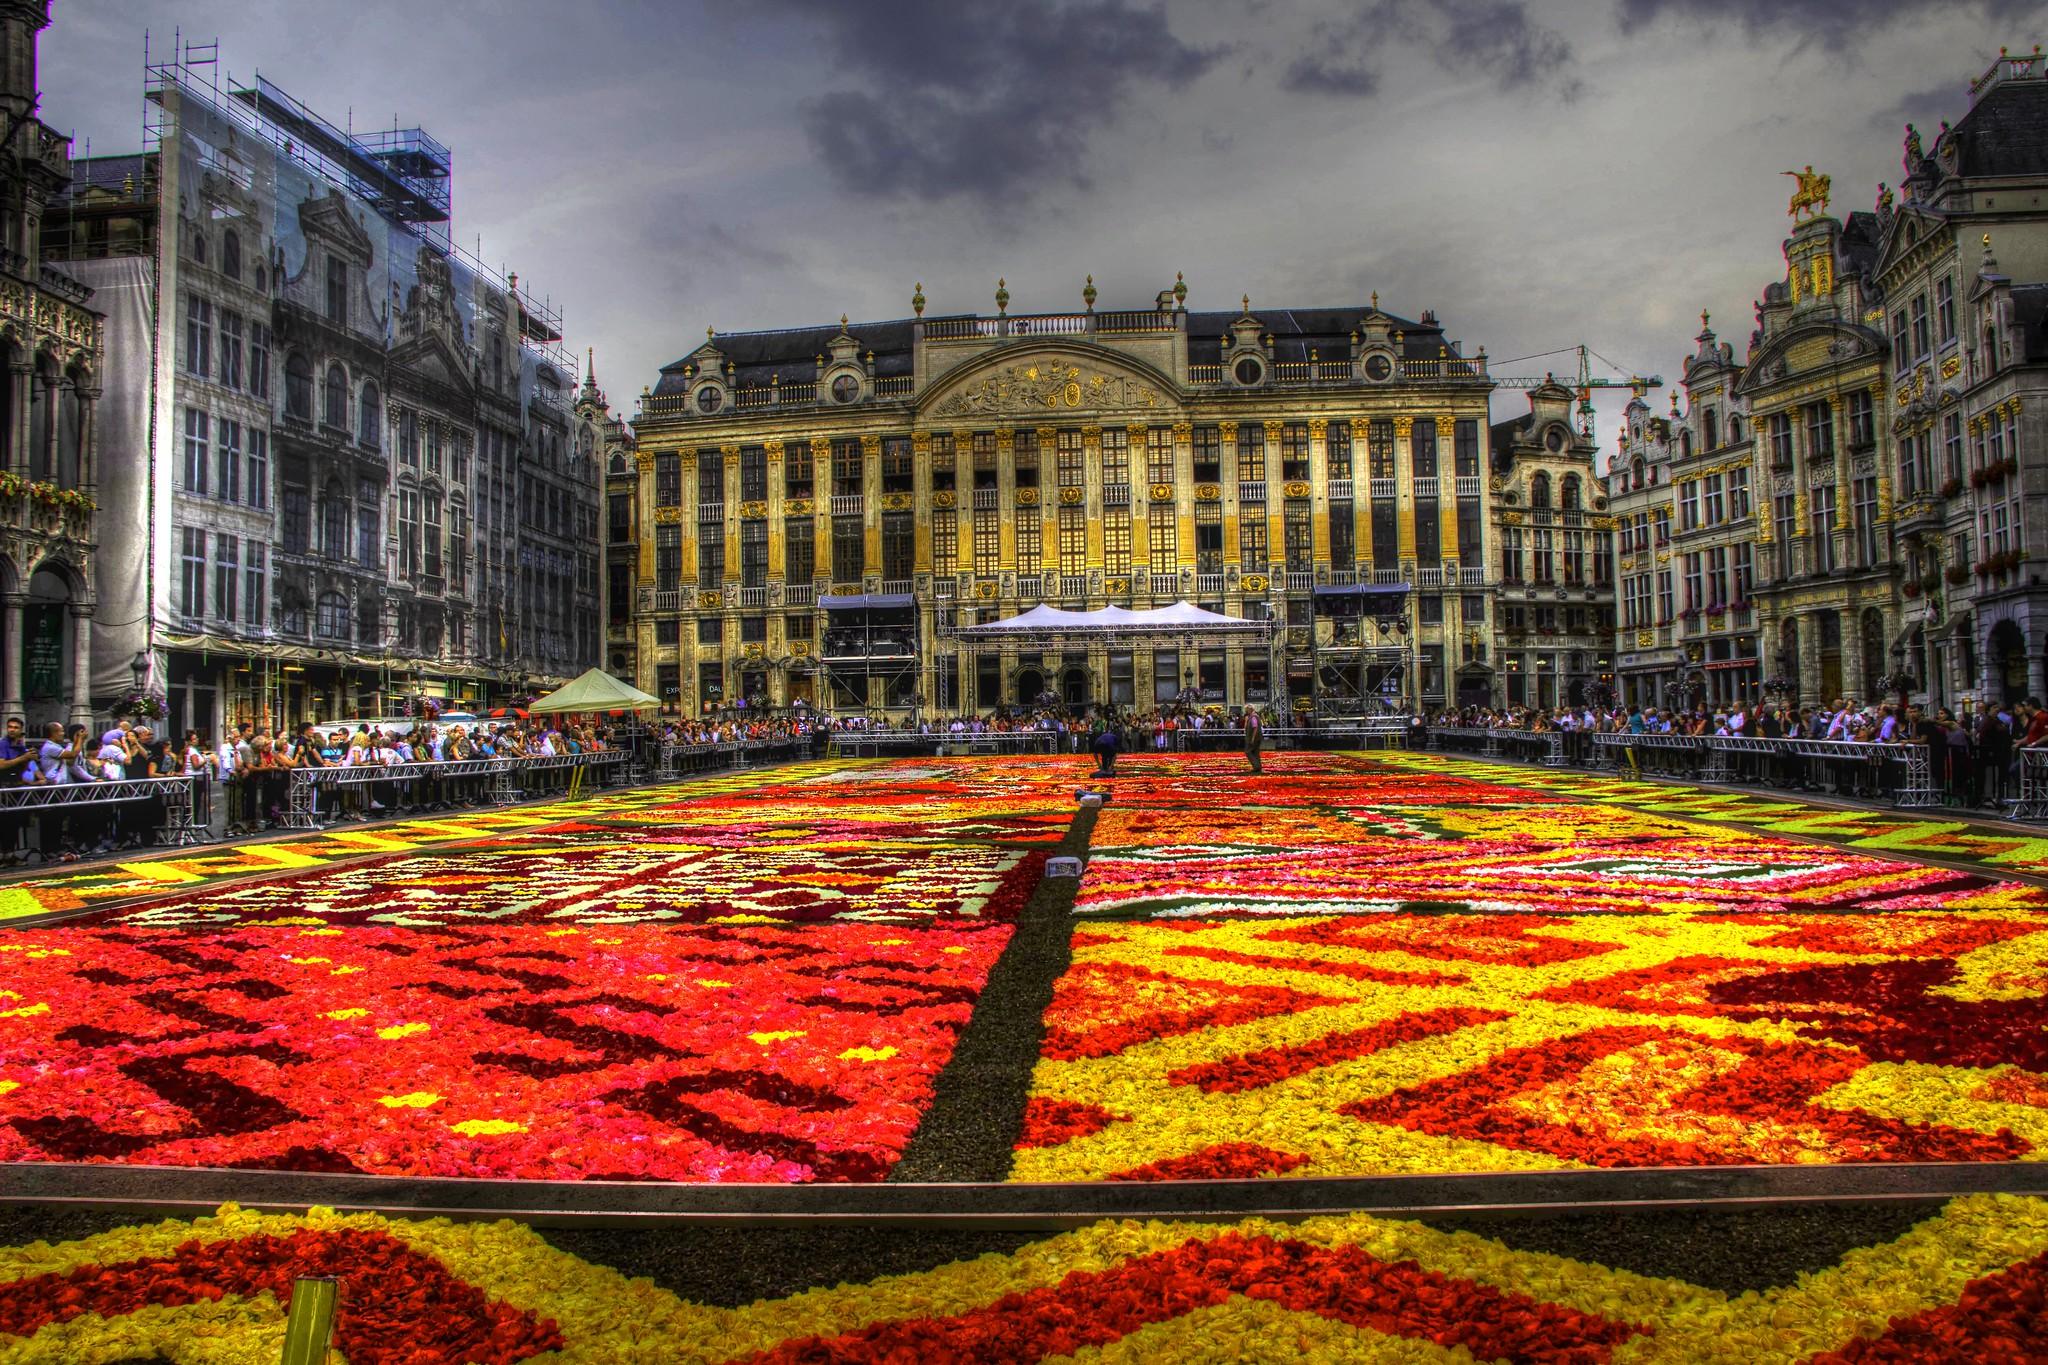 belgique bruxelles grand place tapis de fleurs 2012 flickr photo sharing. Black Bedroom Furniture Sets. Home Design Ideas